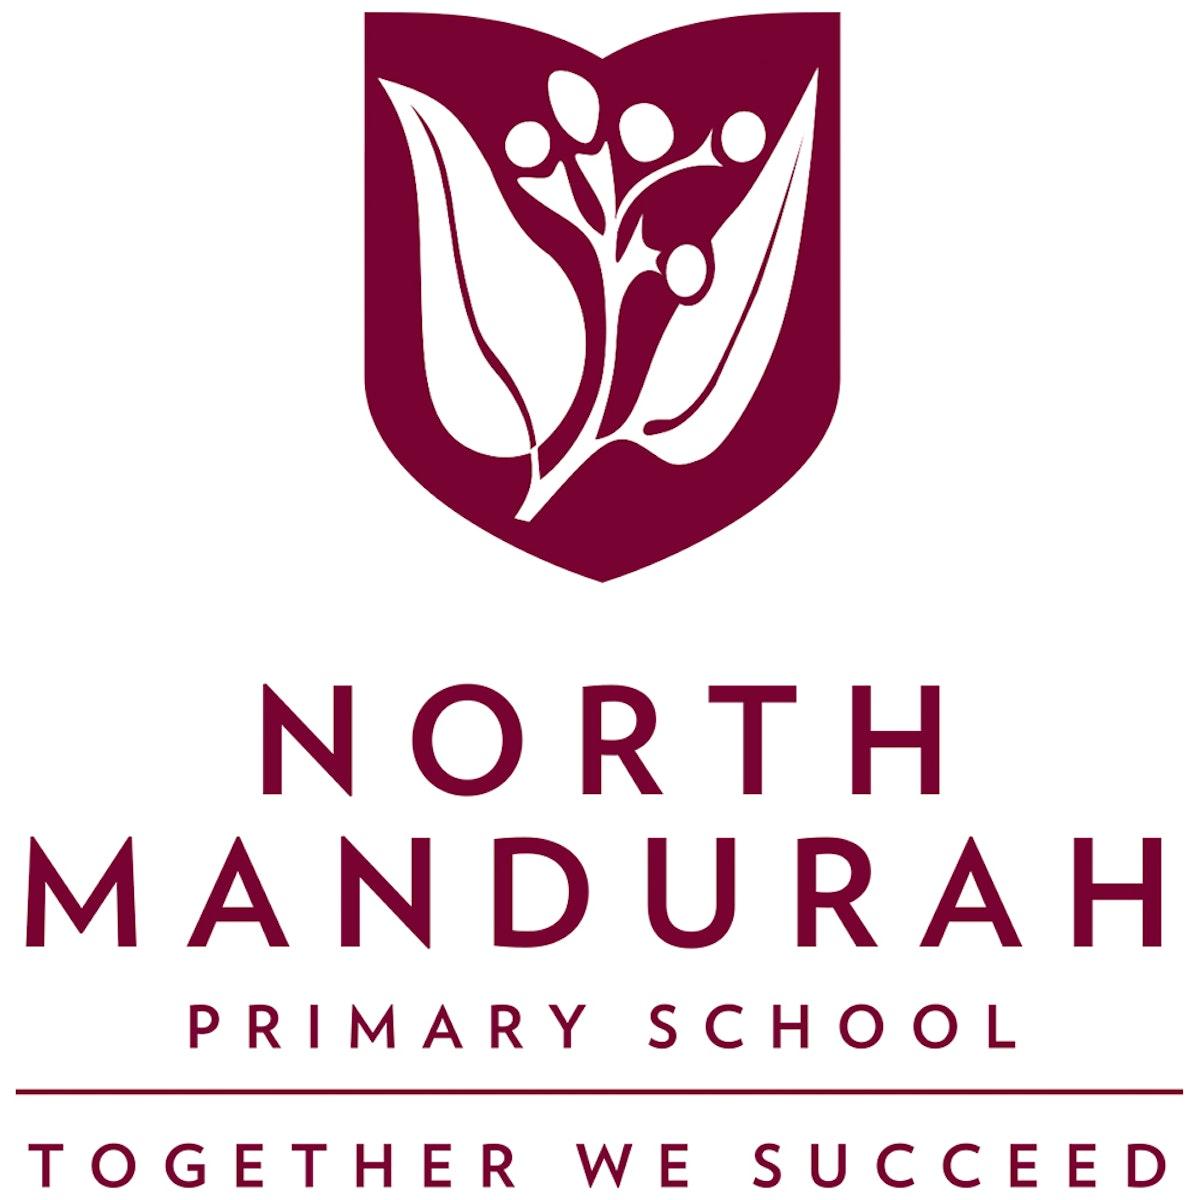 NorthMandurahPS_RGB_VERT